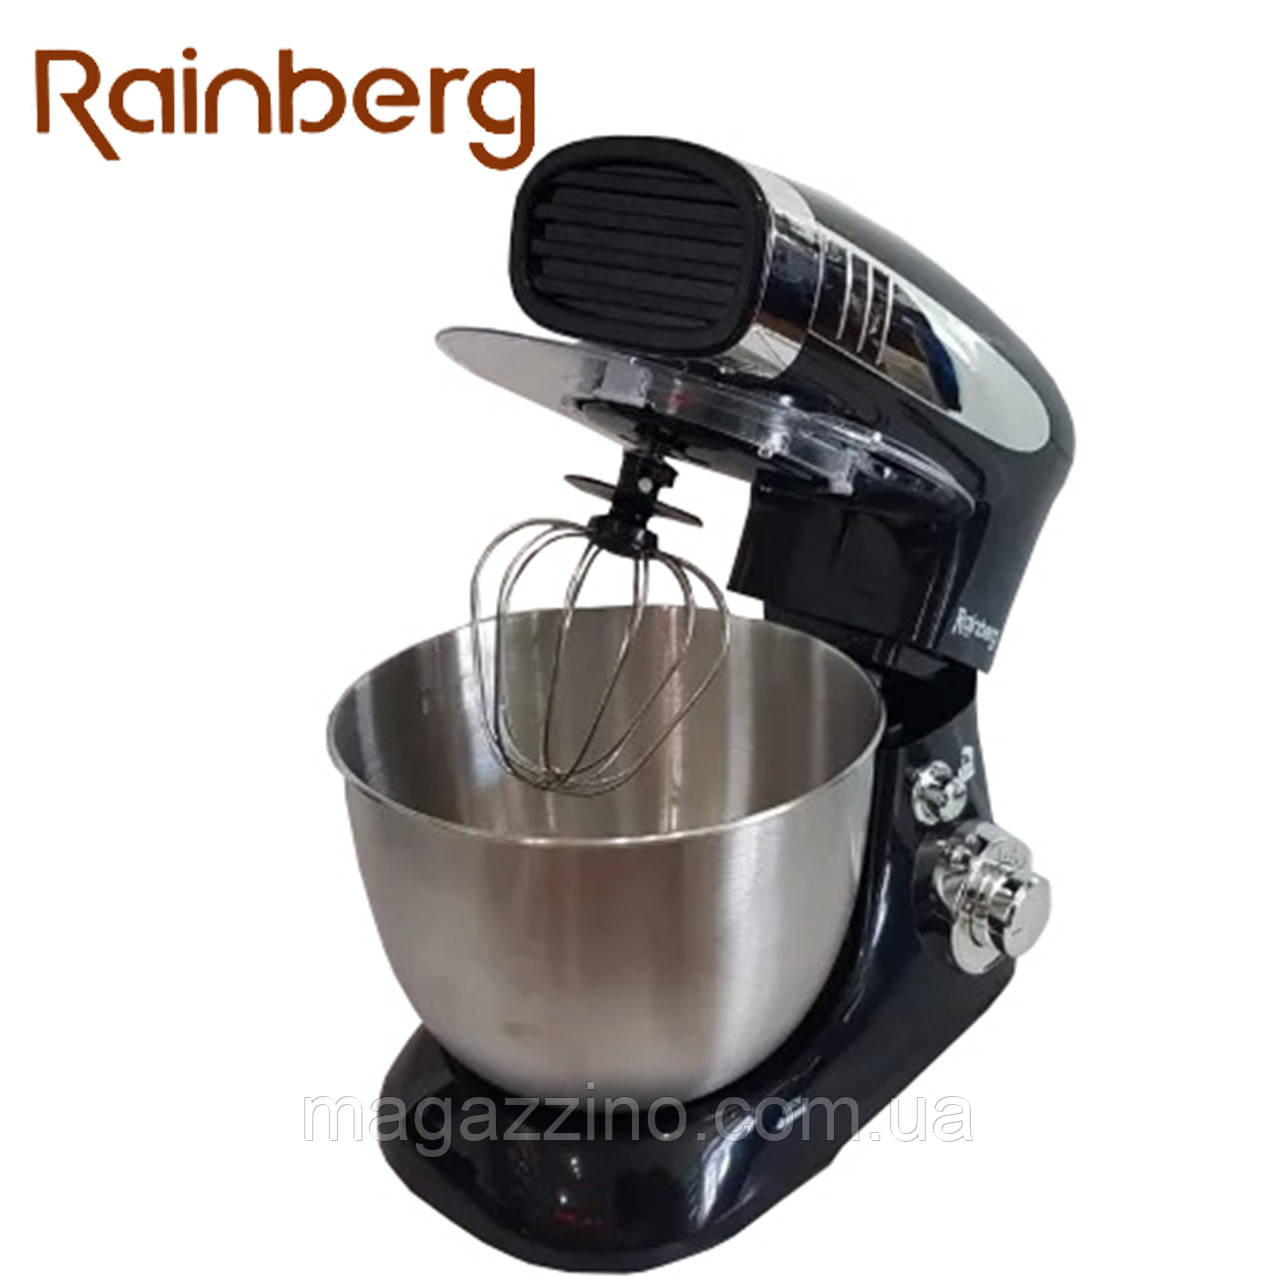 Тестомес, кухонный комбайн, миксер с чашей Rainberg RB-8081, 1500 Вт.